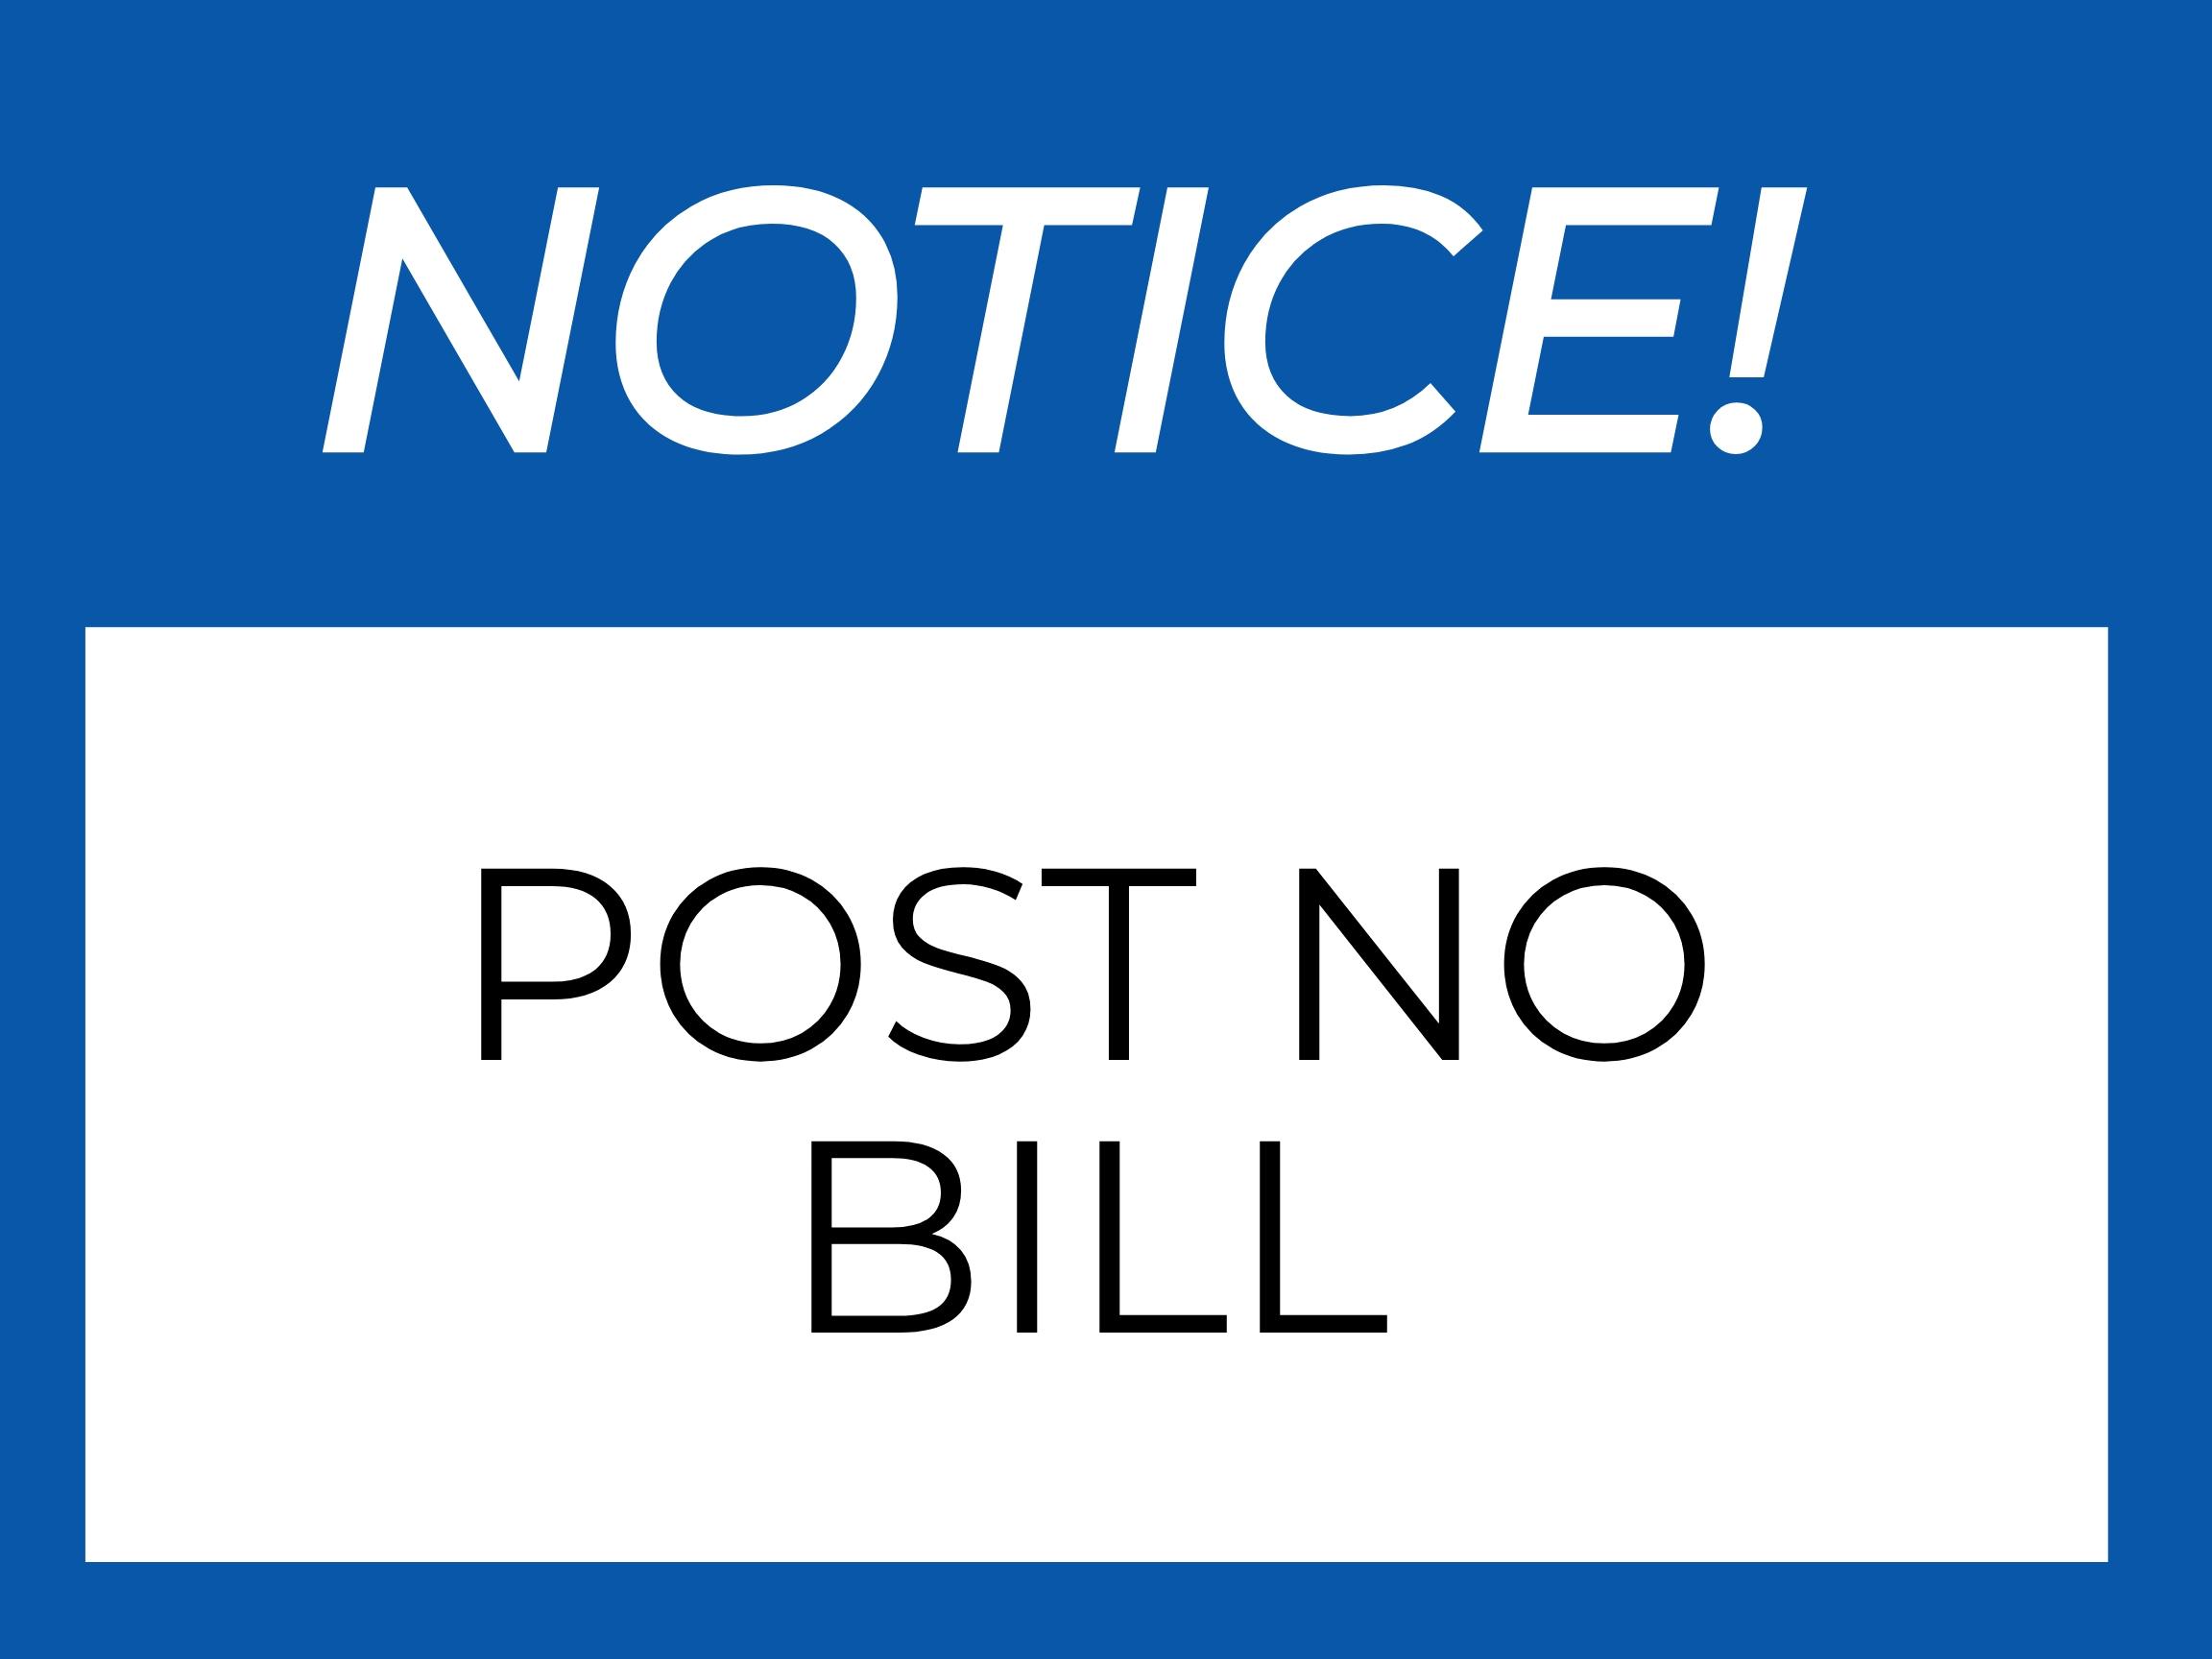 Notice - Post No Bills Sign Template